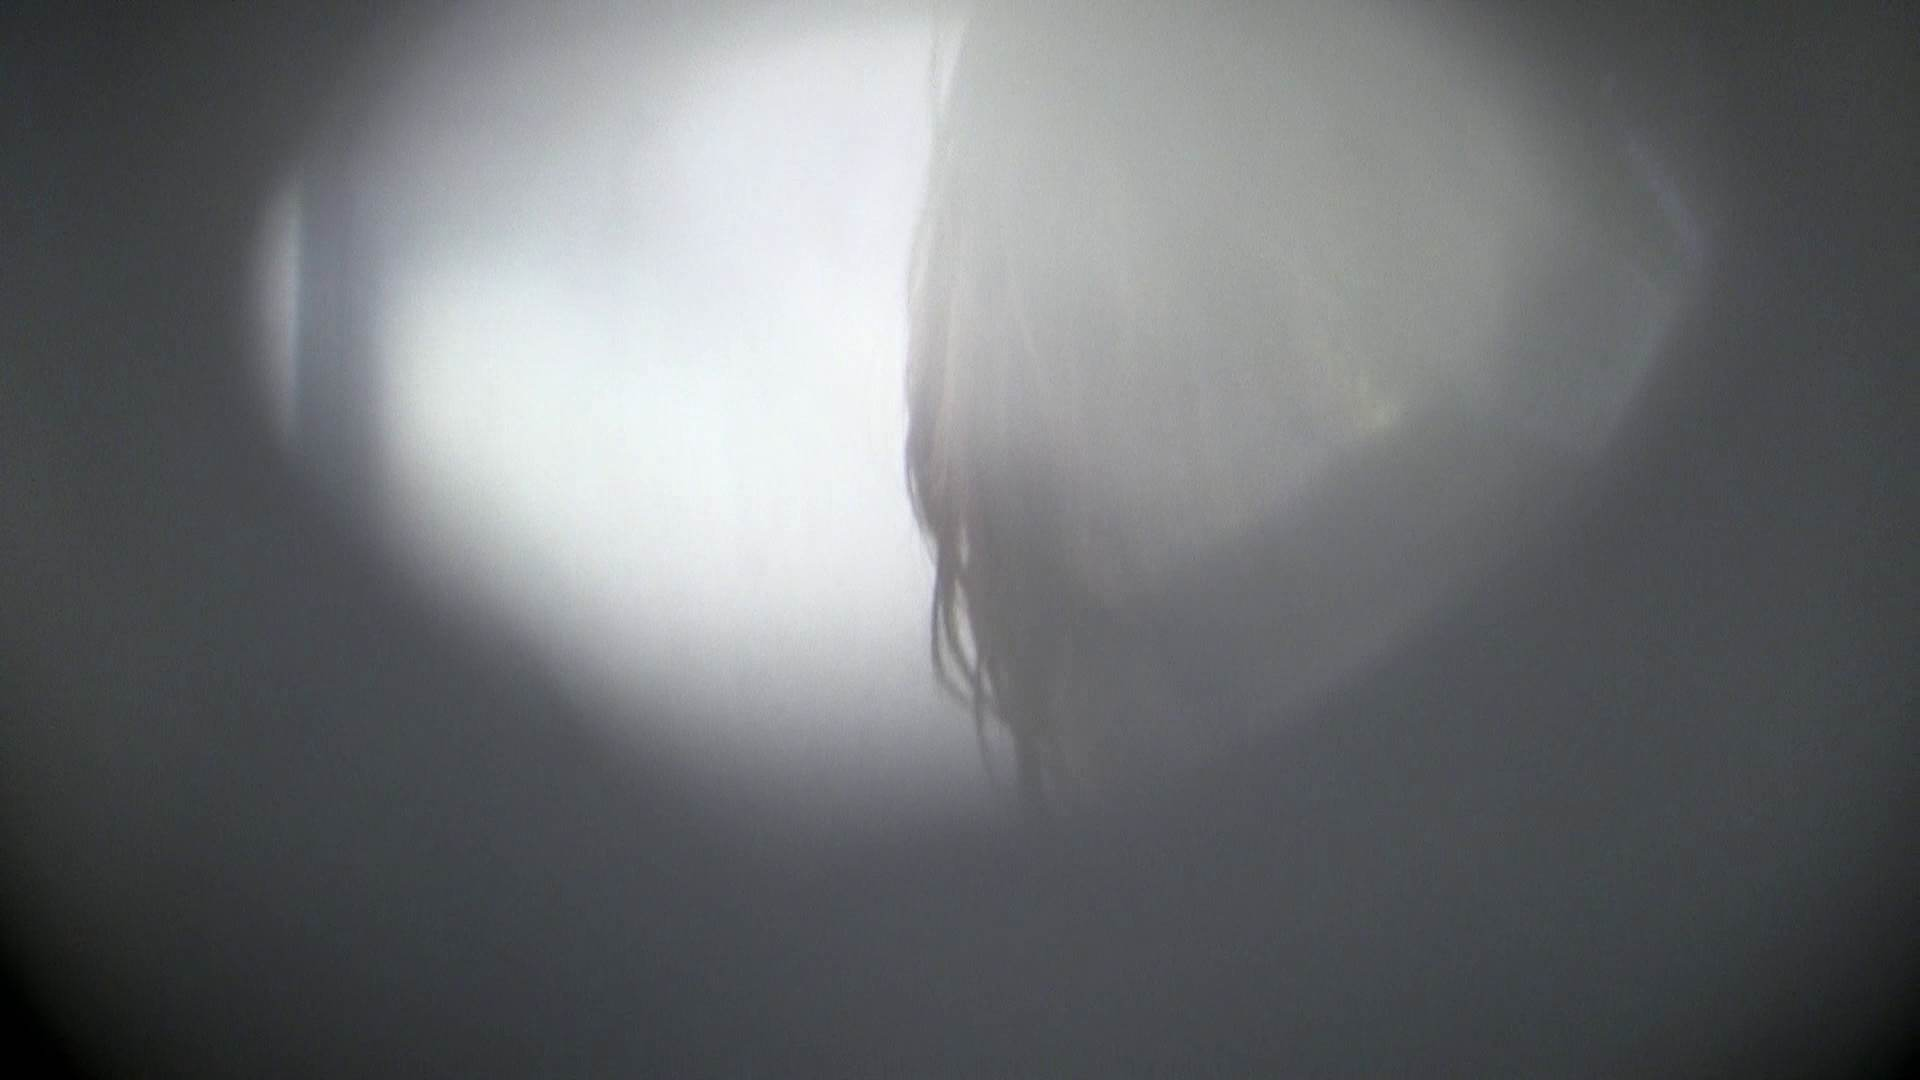 NO.11 年増の一本道!!中身ハミ出てます 丸見え オマンコ無修正動画無料 97画像 9